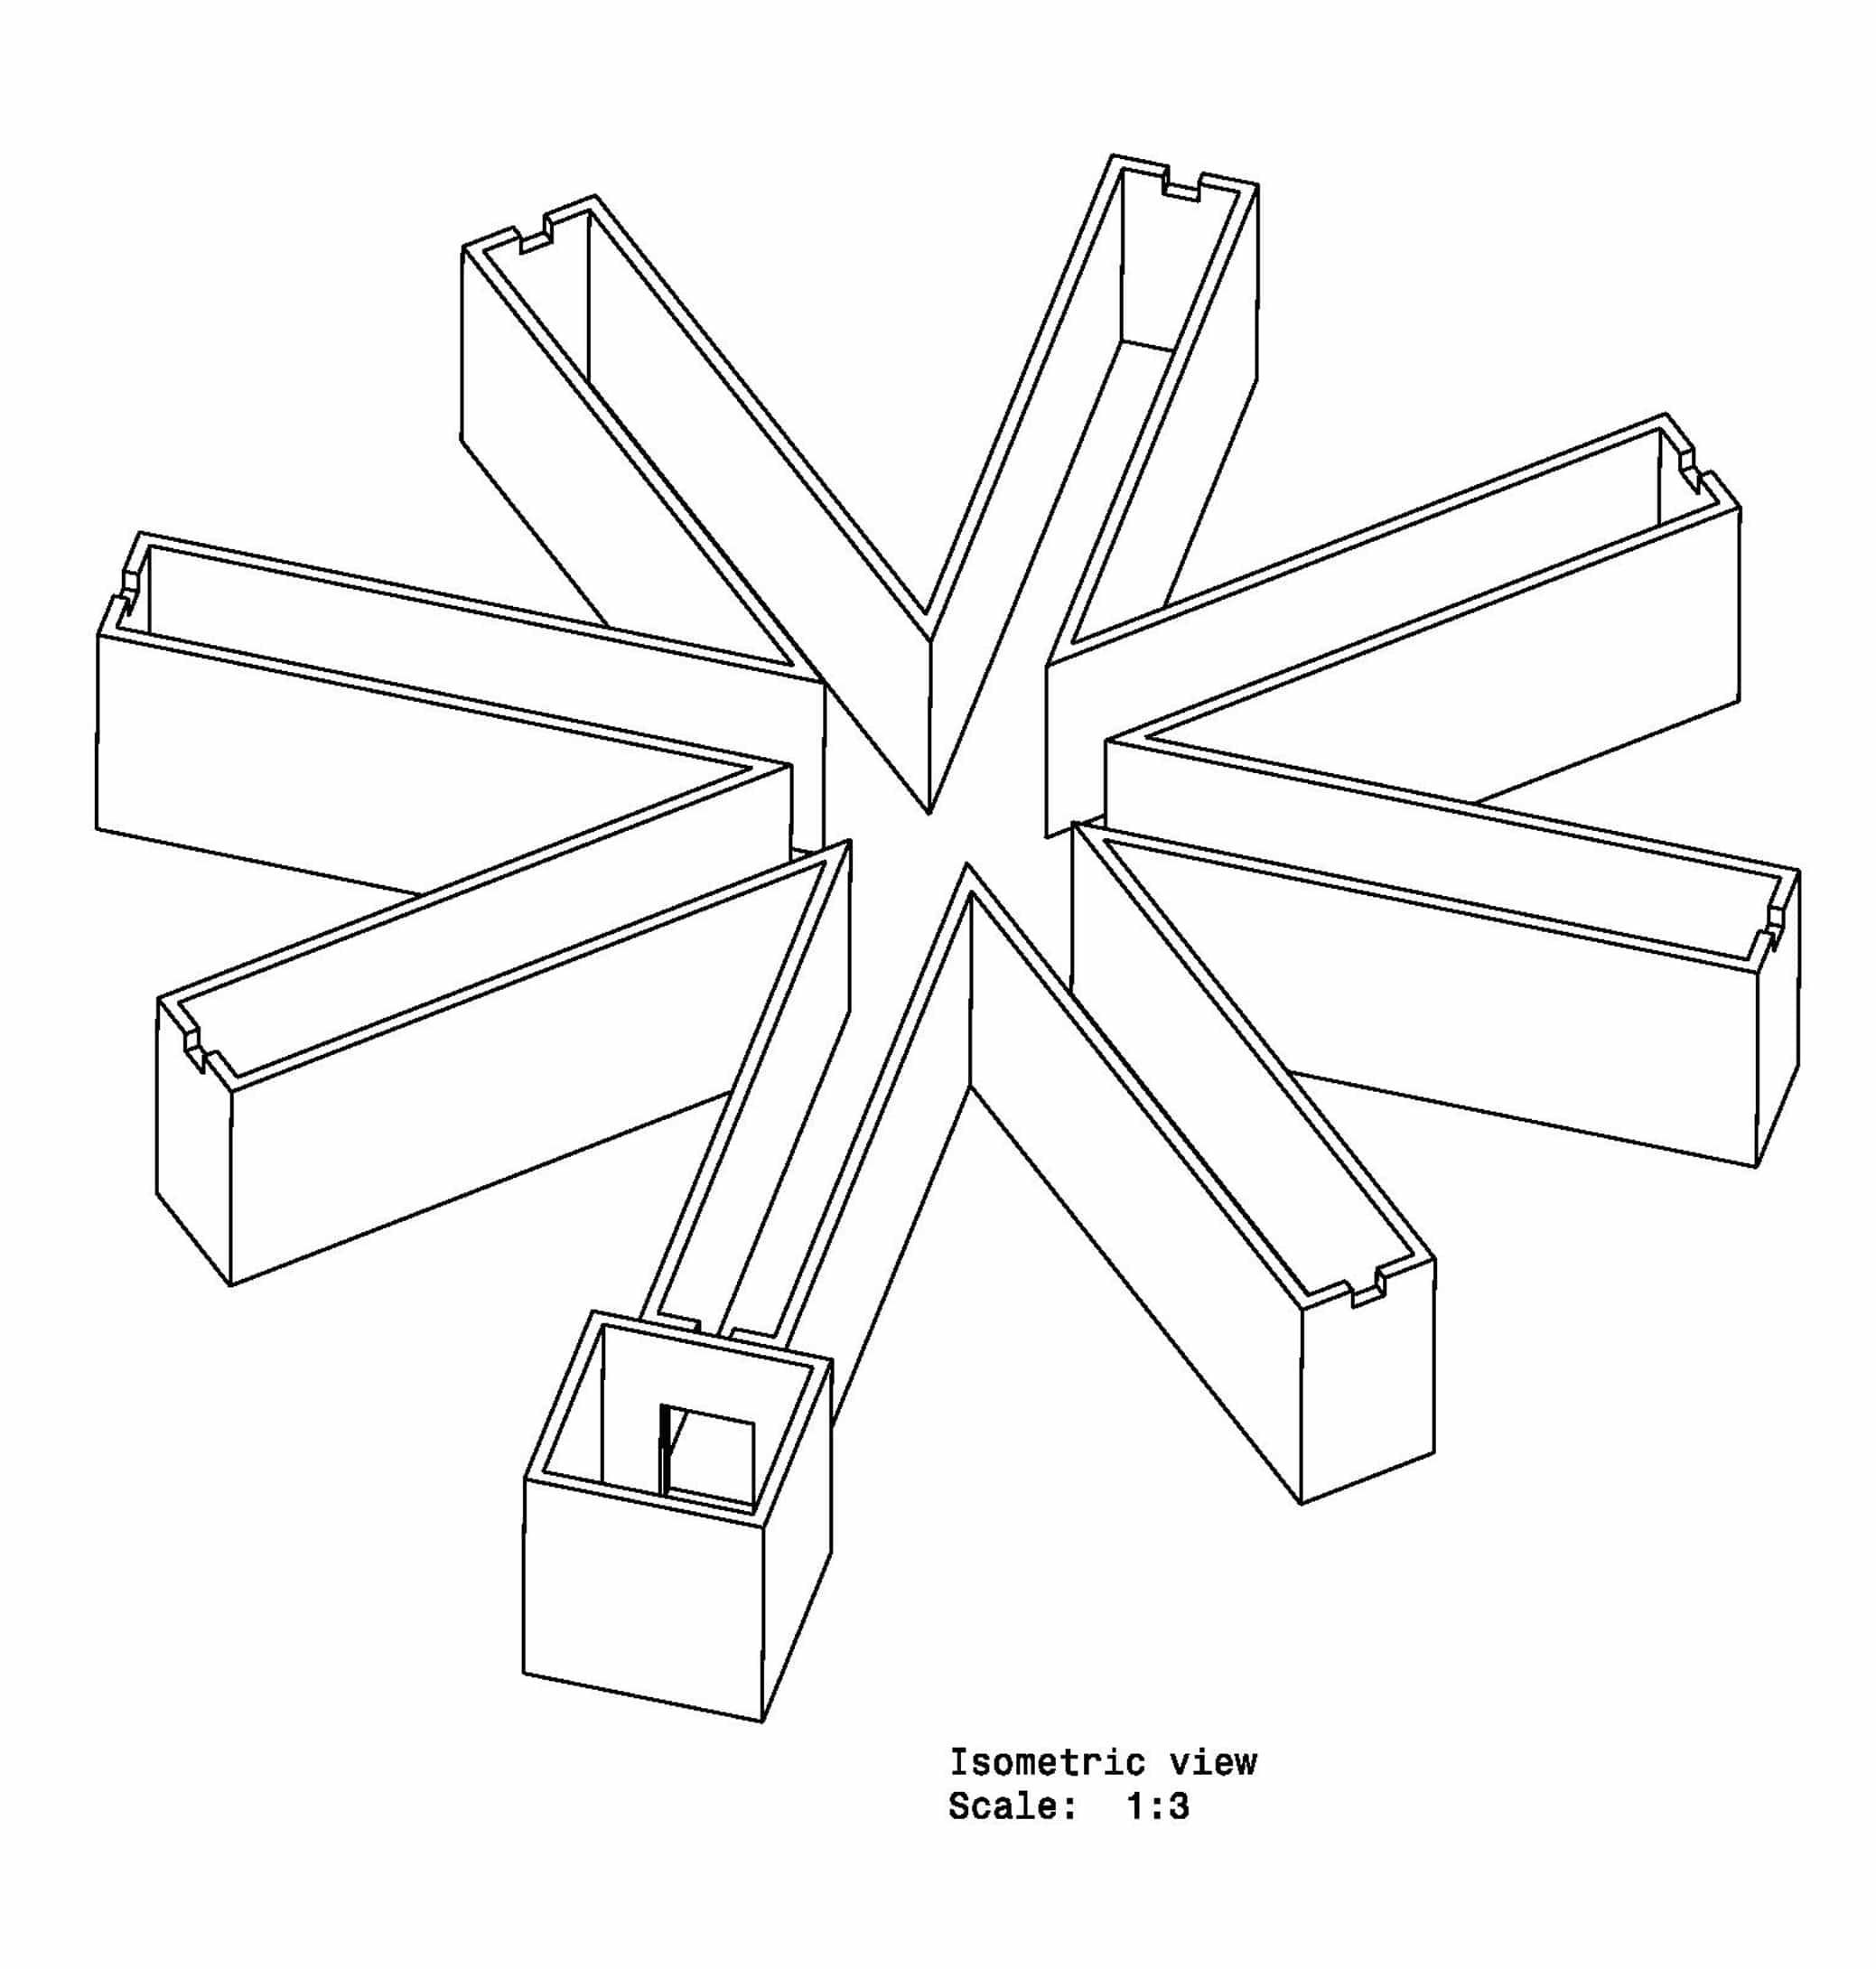 Radial Arm Maze - Goal Box - Mouse - Image 1